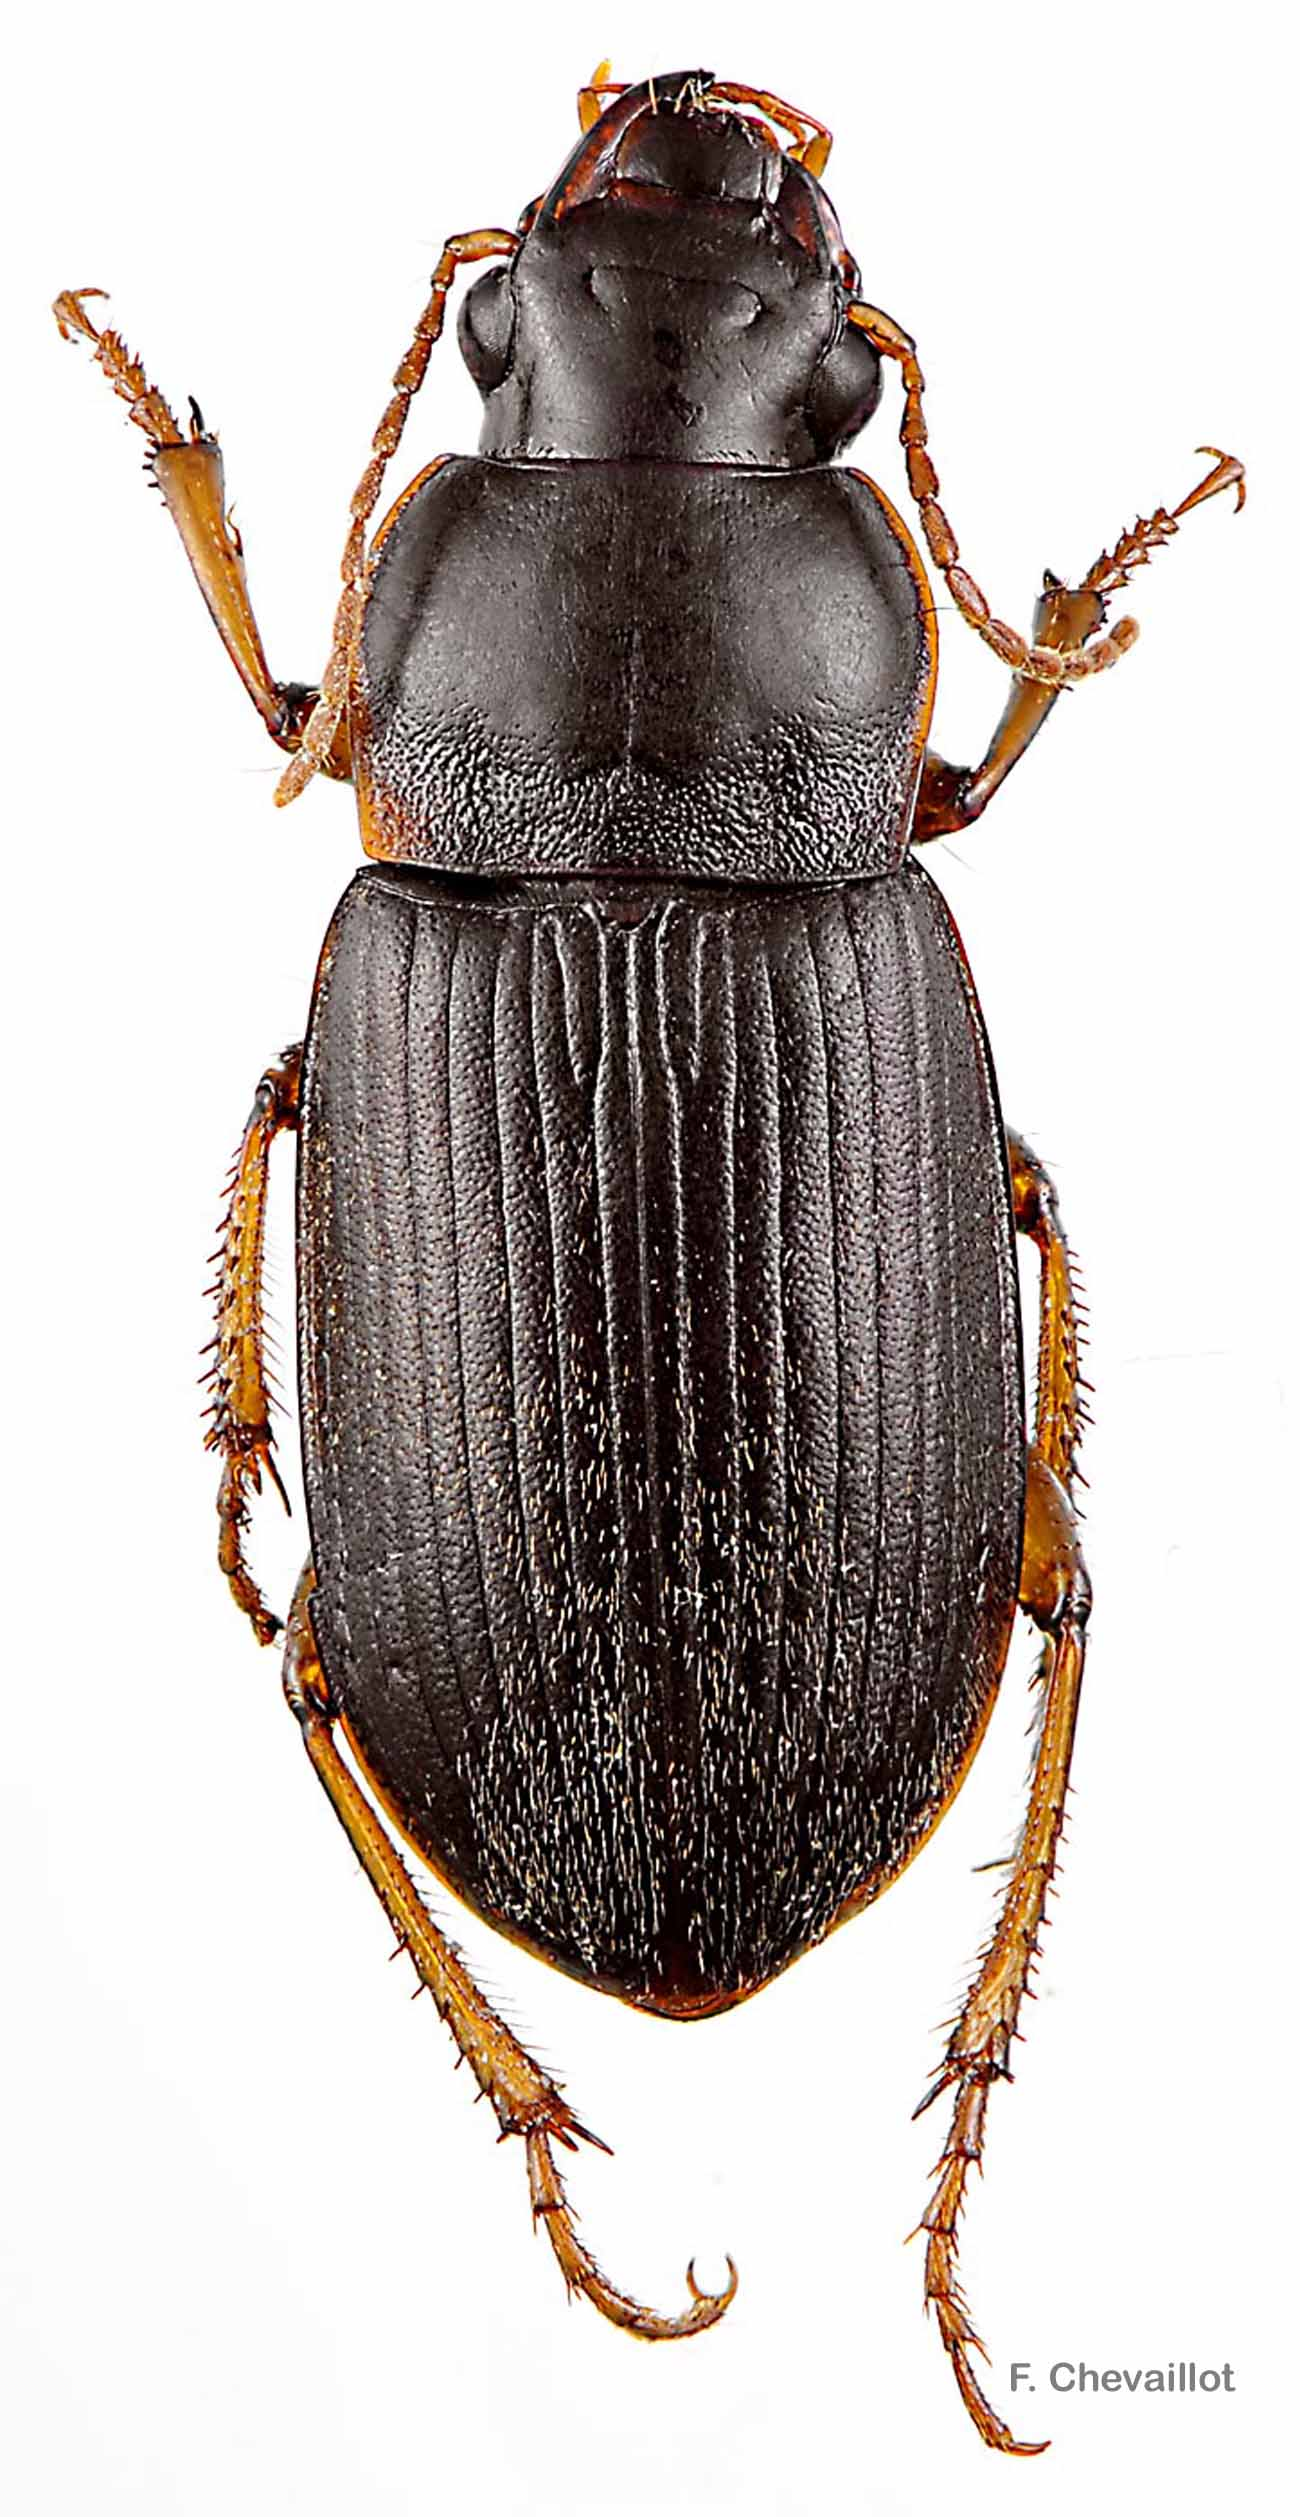 Pseudoophonus griseus